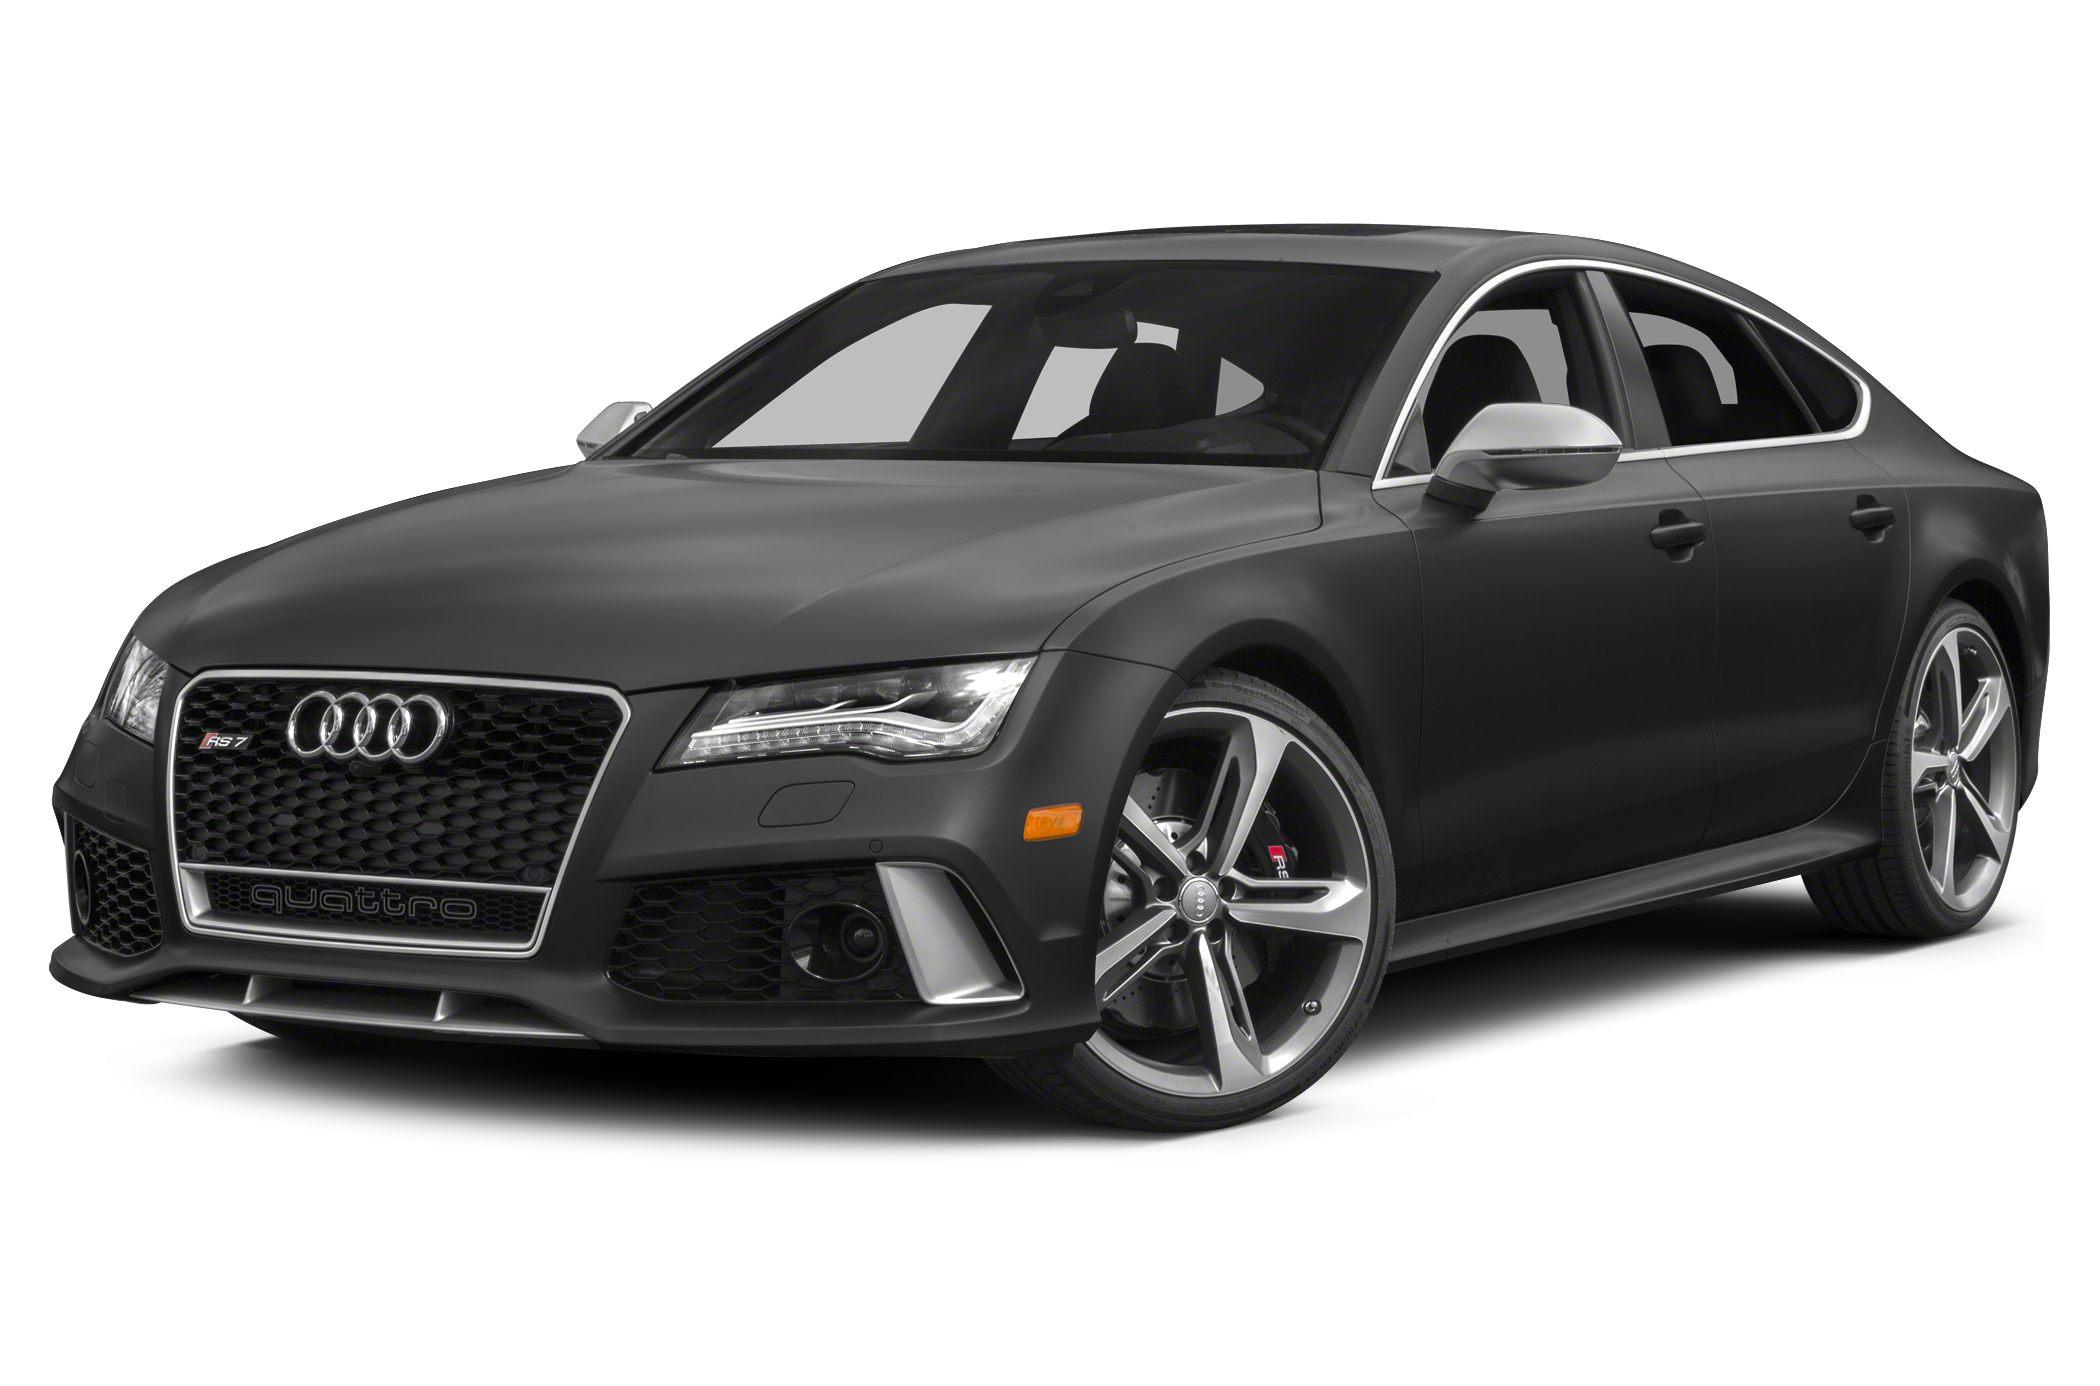 2014 Audi RS7 [w/video]